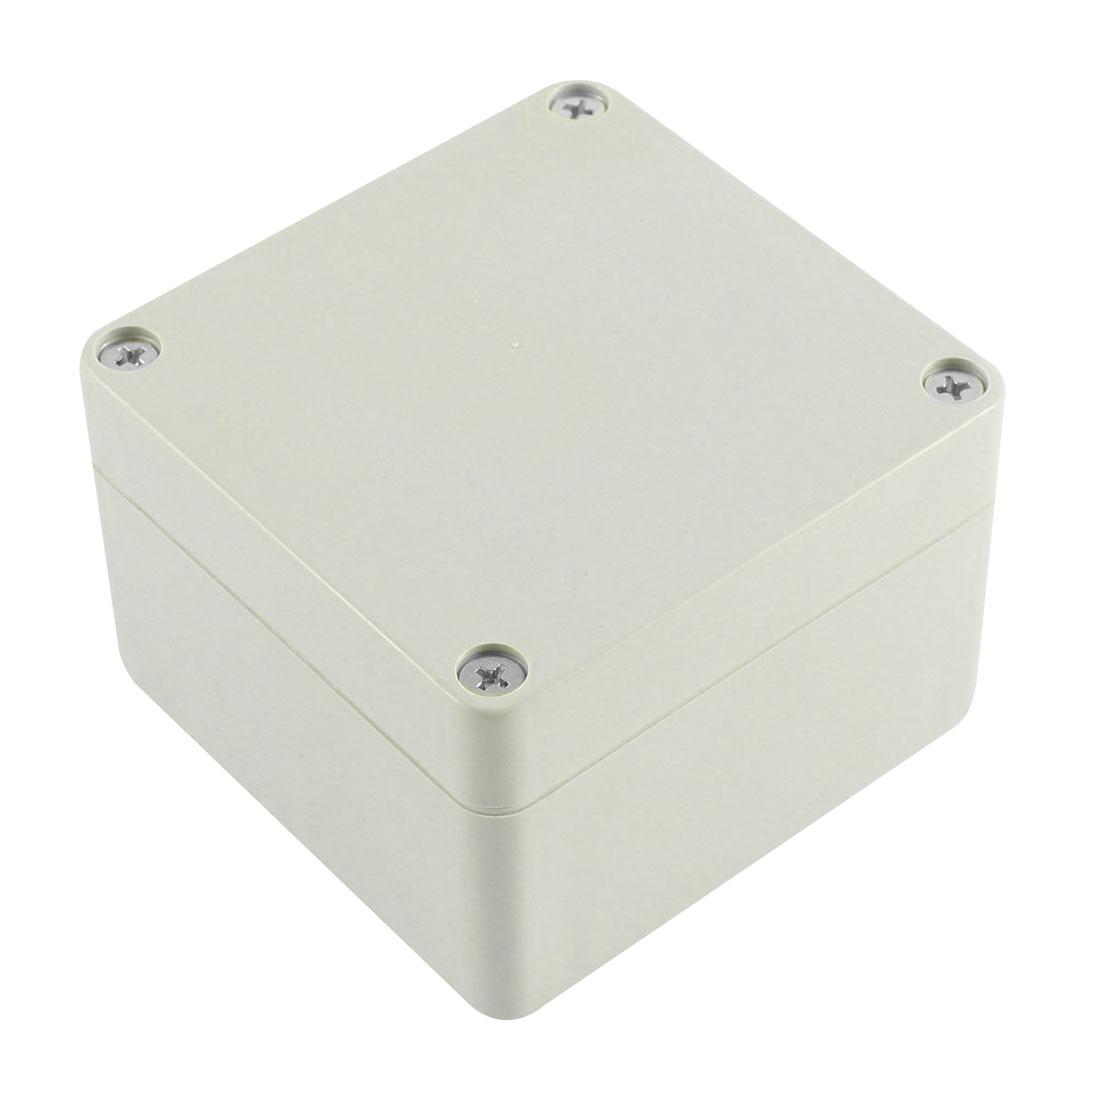 Electrical Plastic Enclosure Dustproof IP65 Project Junction Box 82 x 80 x 56mm